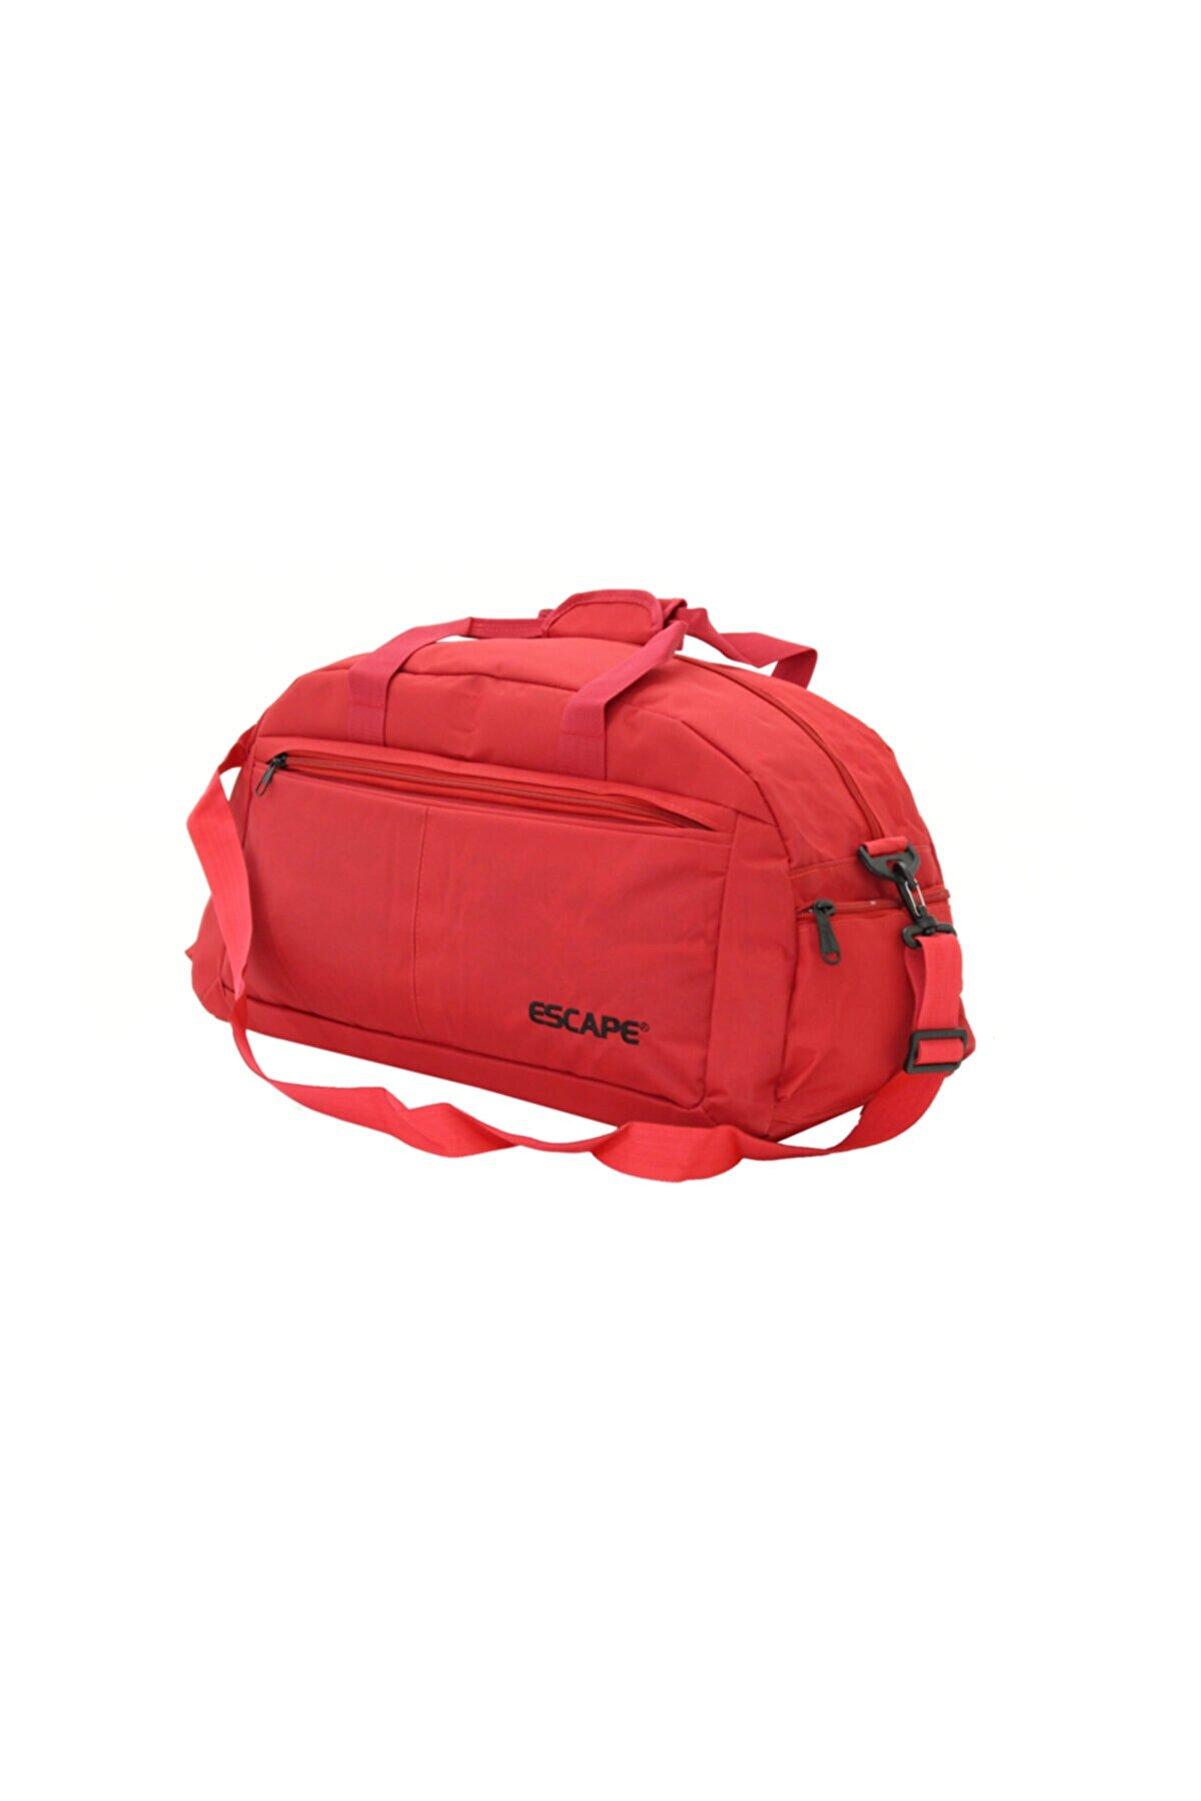 ESCAPE 106 Polyester Kumaş Seyahat Çantası / Spor Çanta